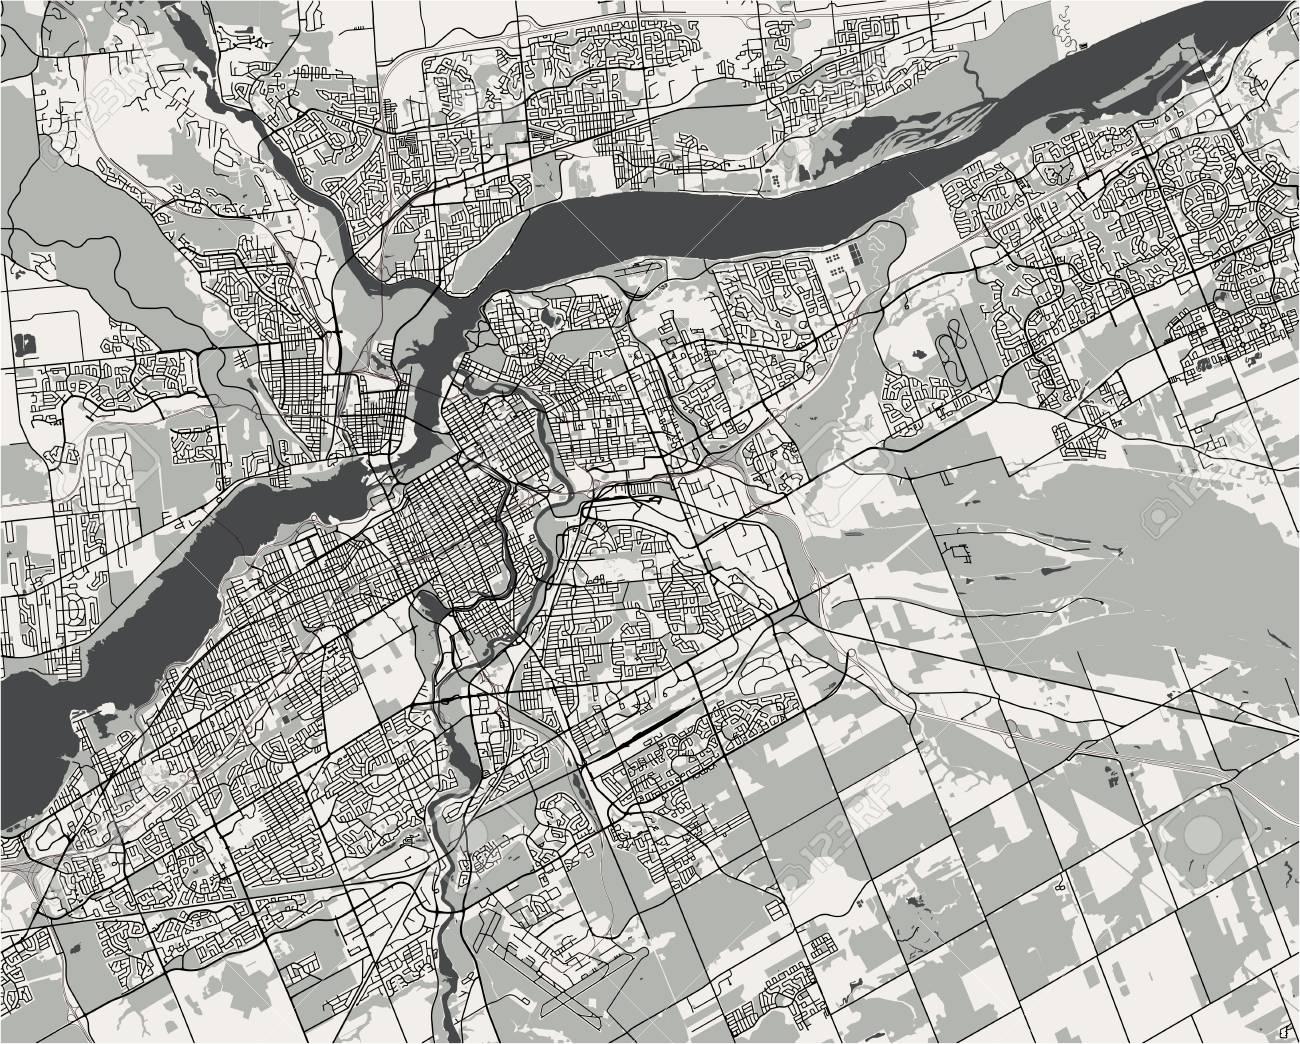 map of the city of Philadelphia, Pennsylvania, USA